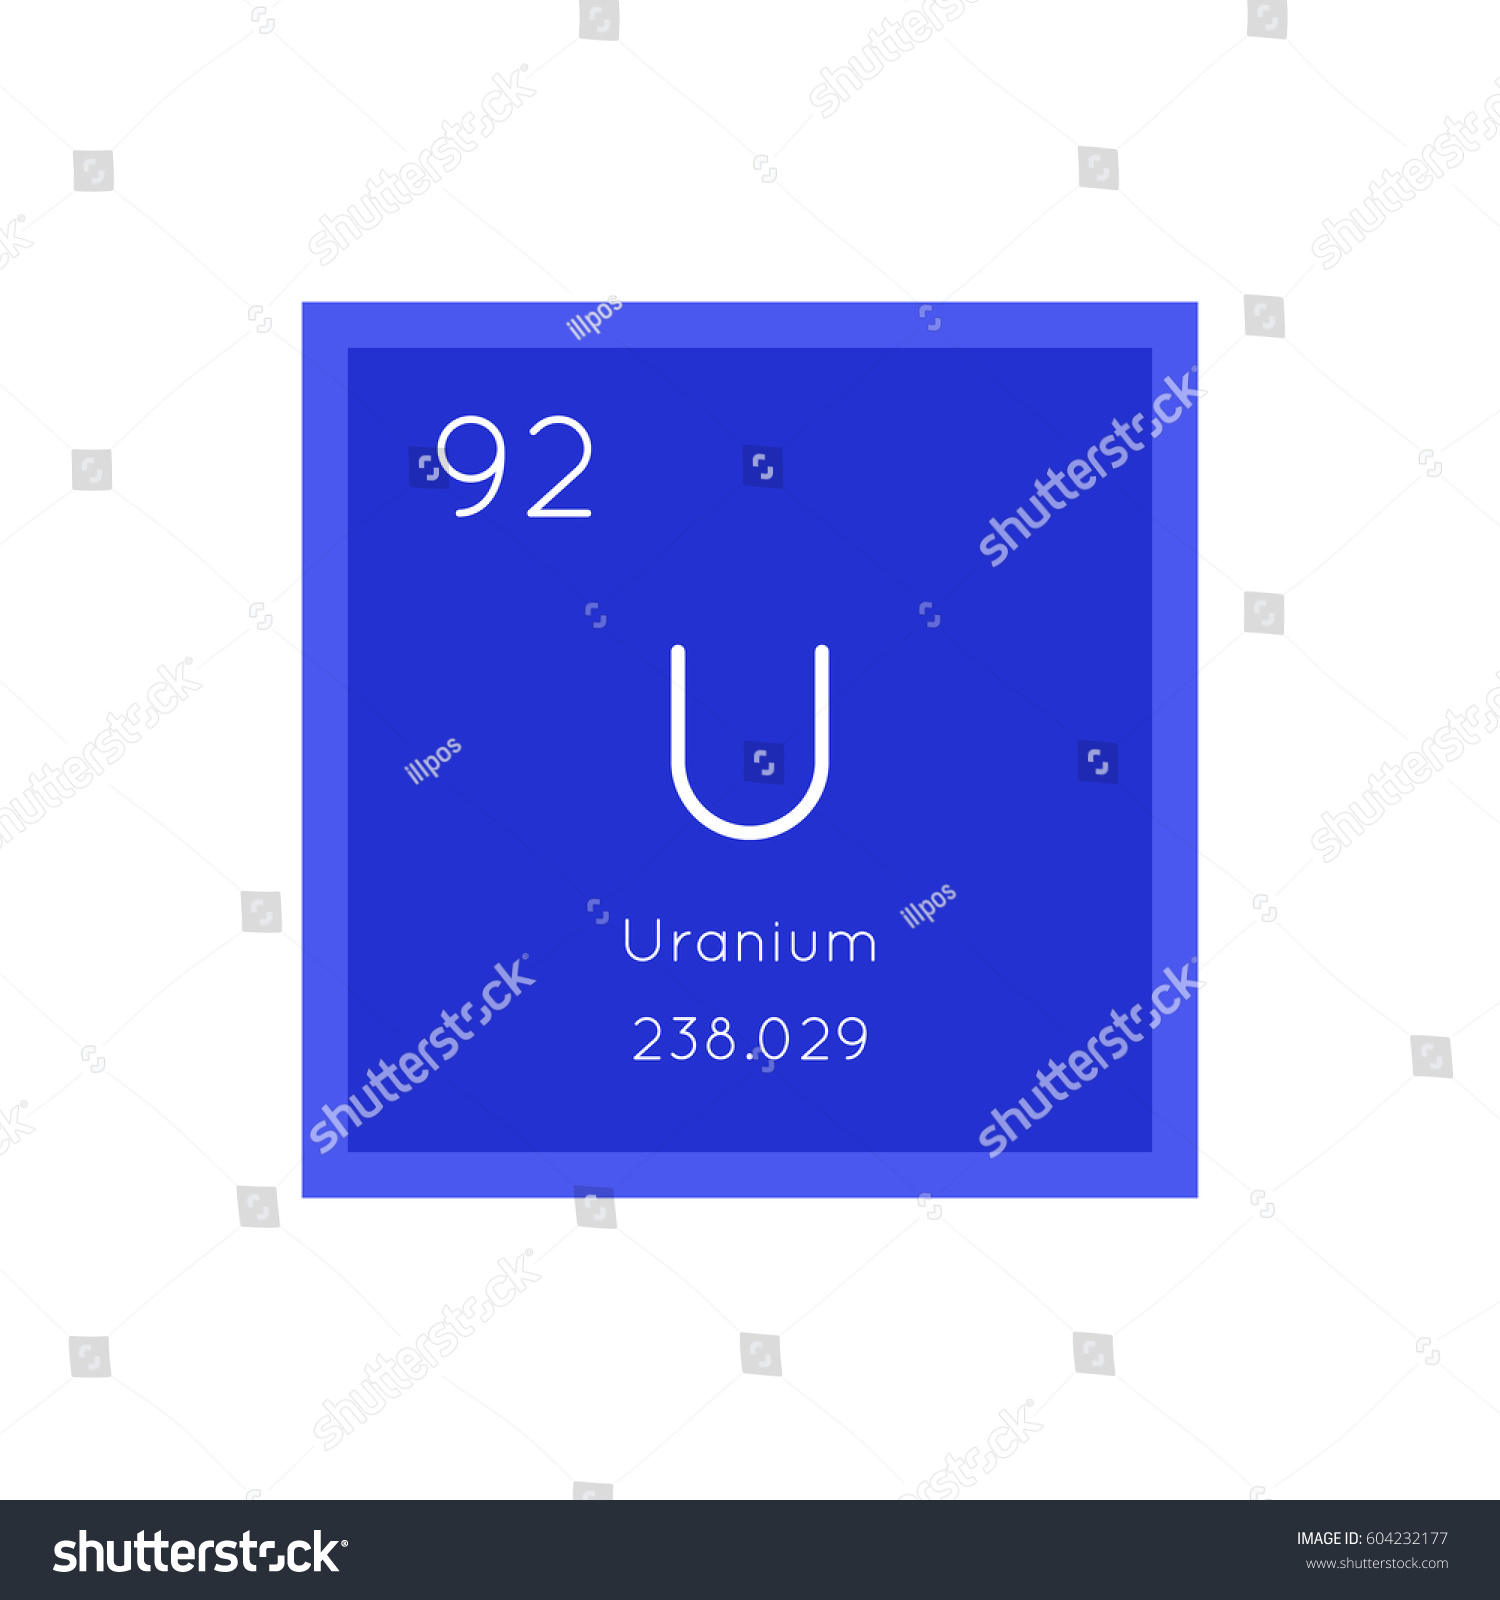 Uranium simple style tile icon chemical stock vector 604232177 uranium simple style tile icon chemical element of periodic table vector illustration eps8 buycottarizona Images